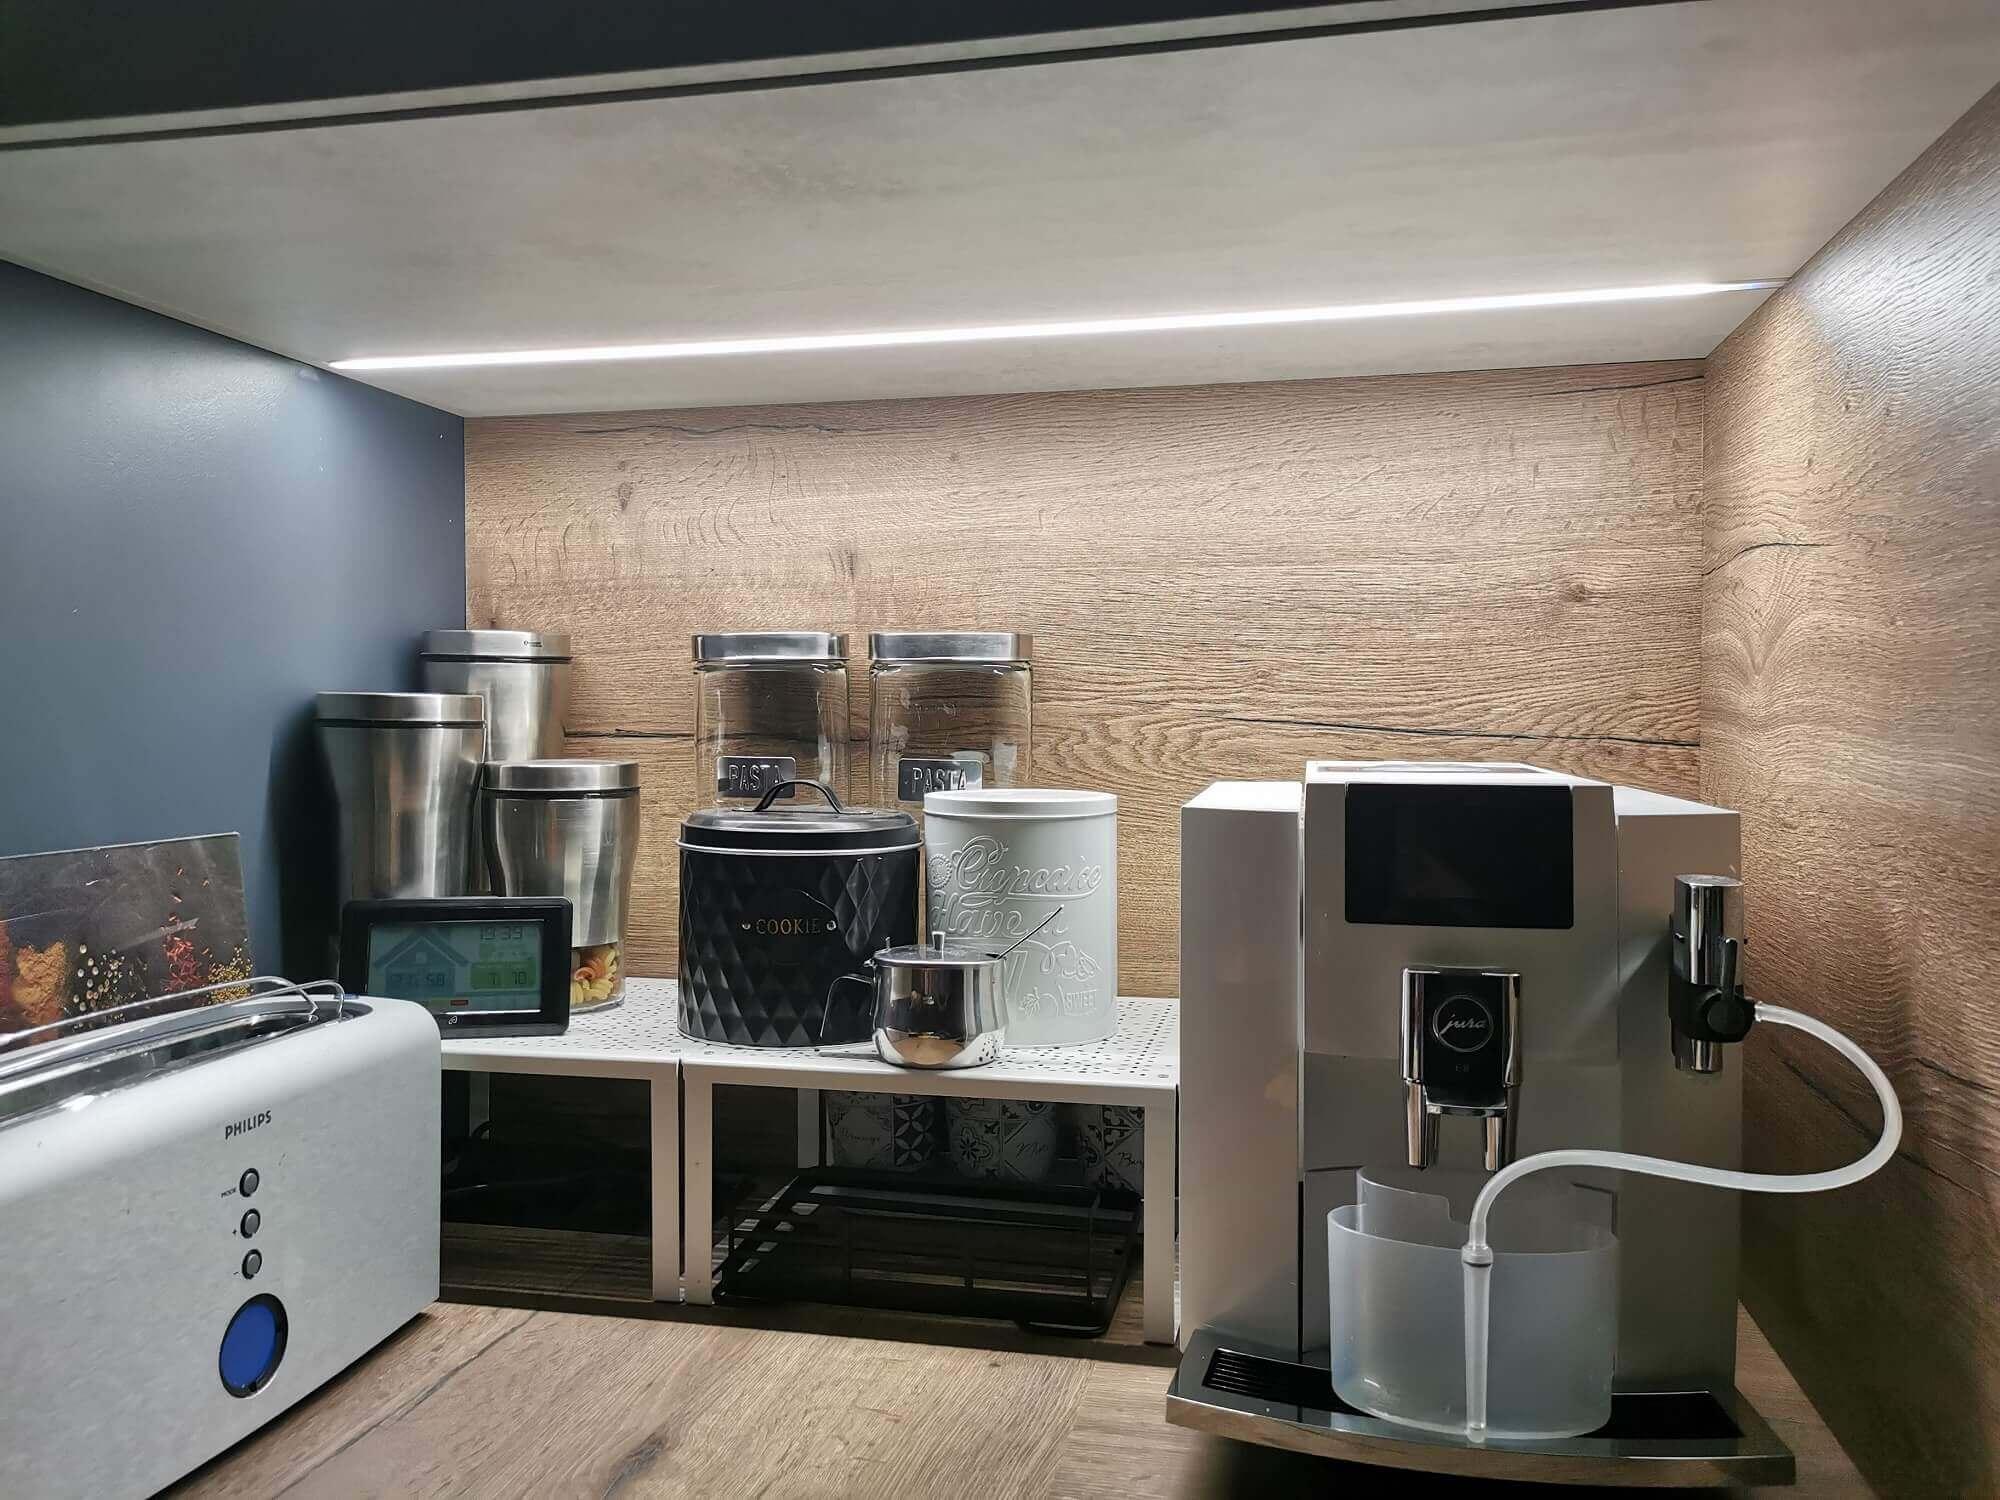 Modern lighting in the kitchen